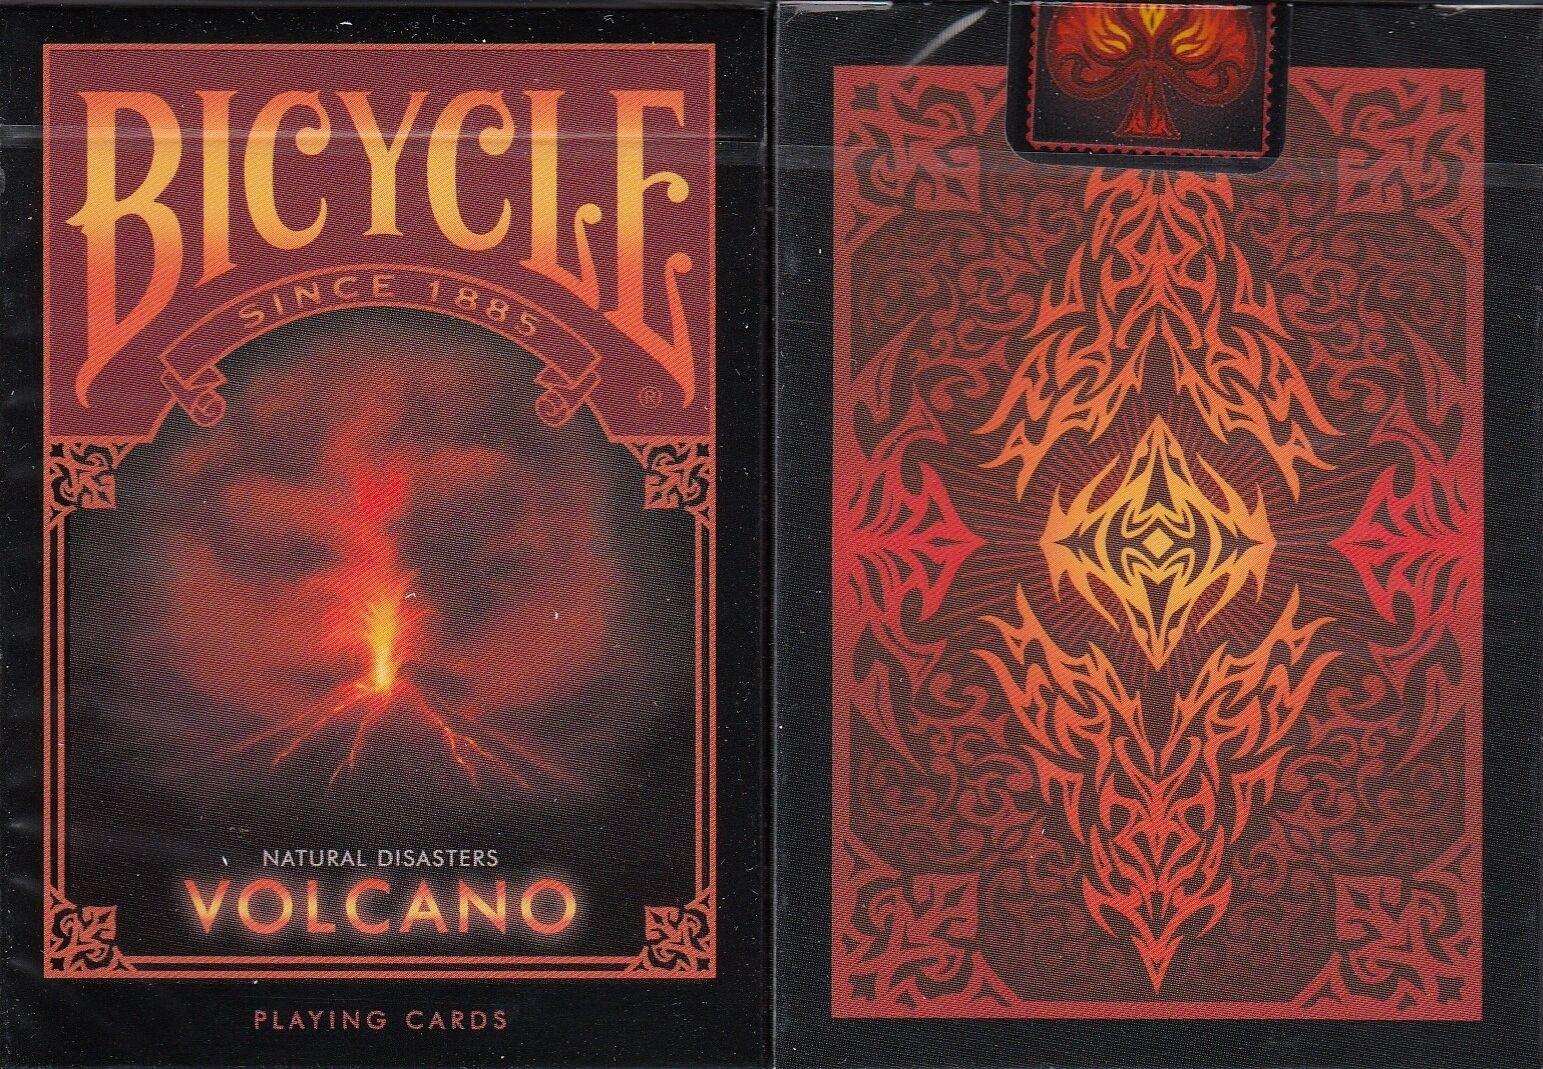 Bicycle Explostar Playing CardsPoker DeckCollectable